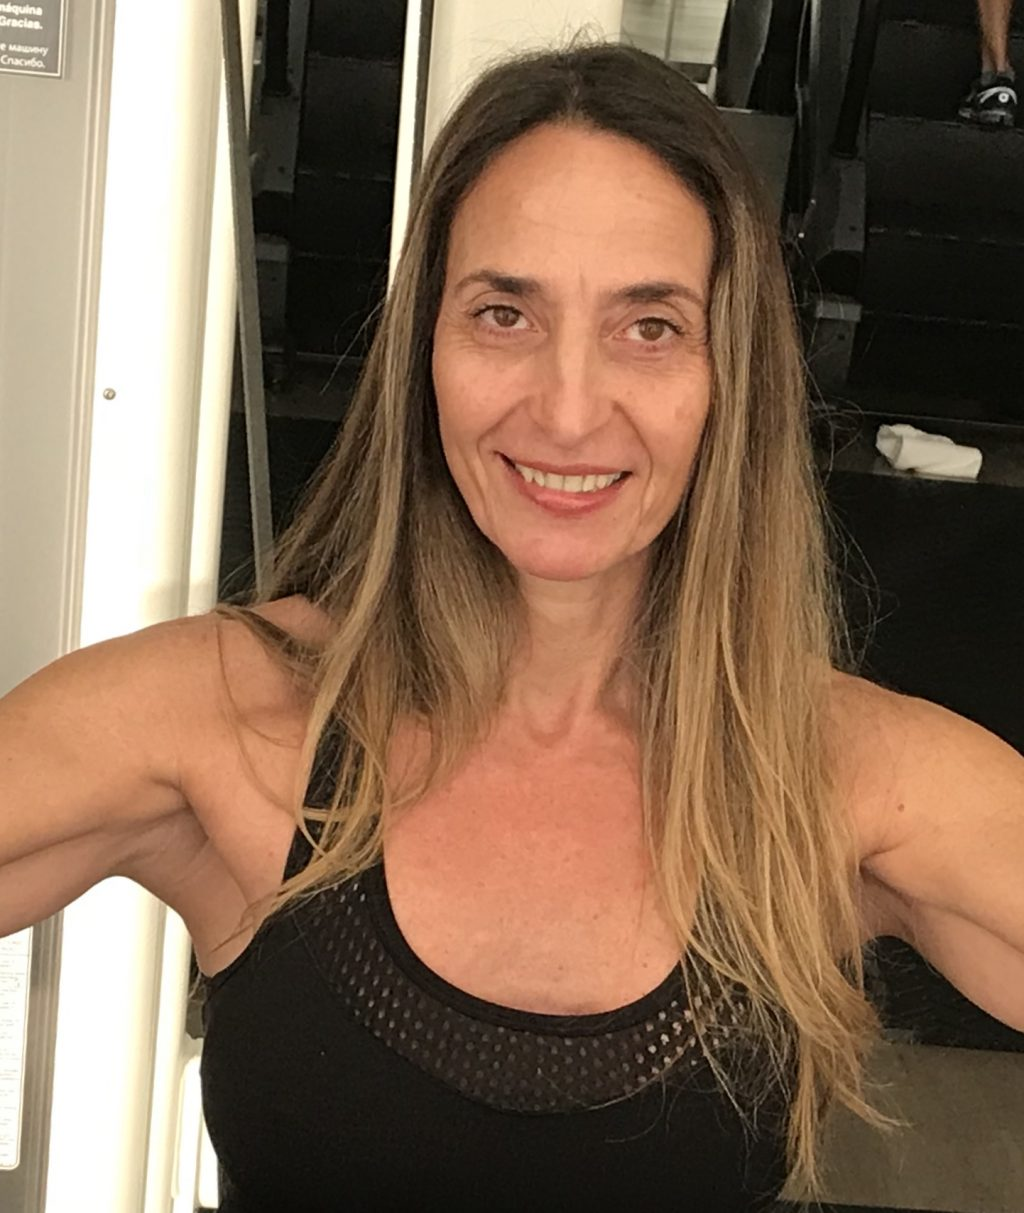 Personal Trainer Aventura, Fl - Elisa Mizrahi